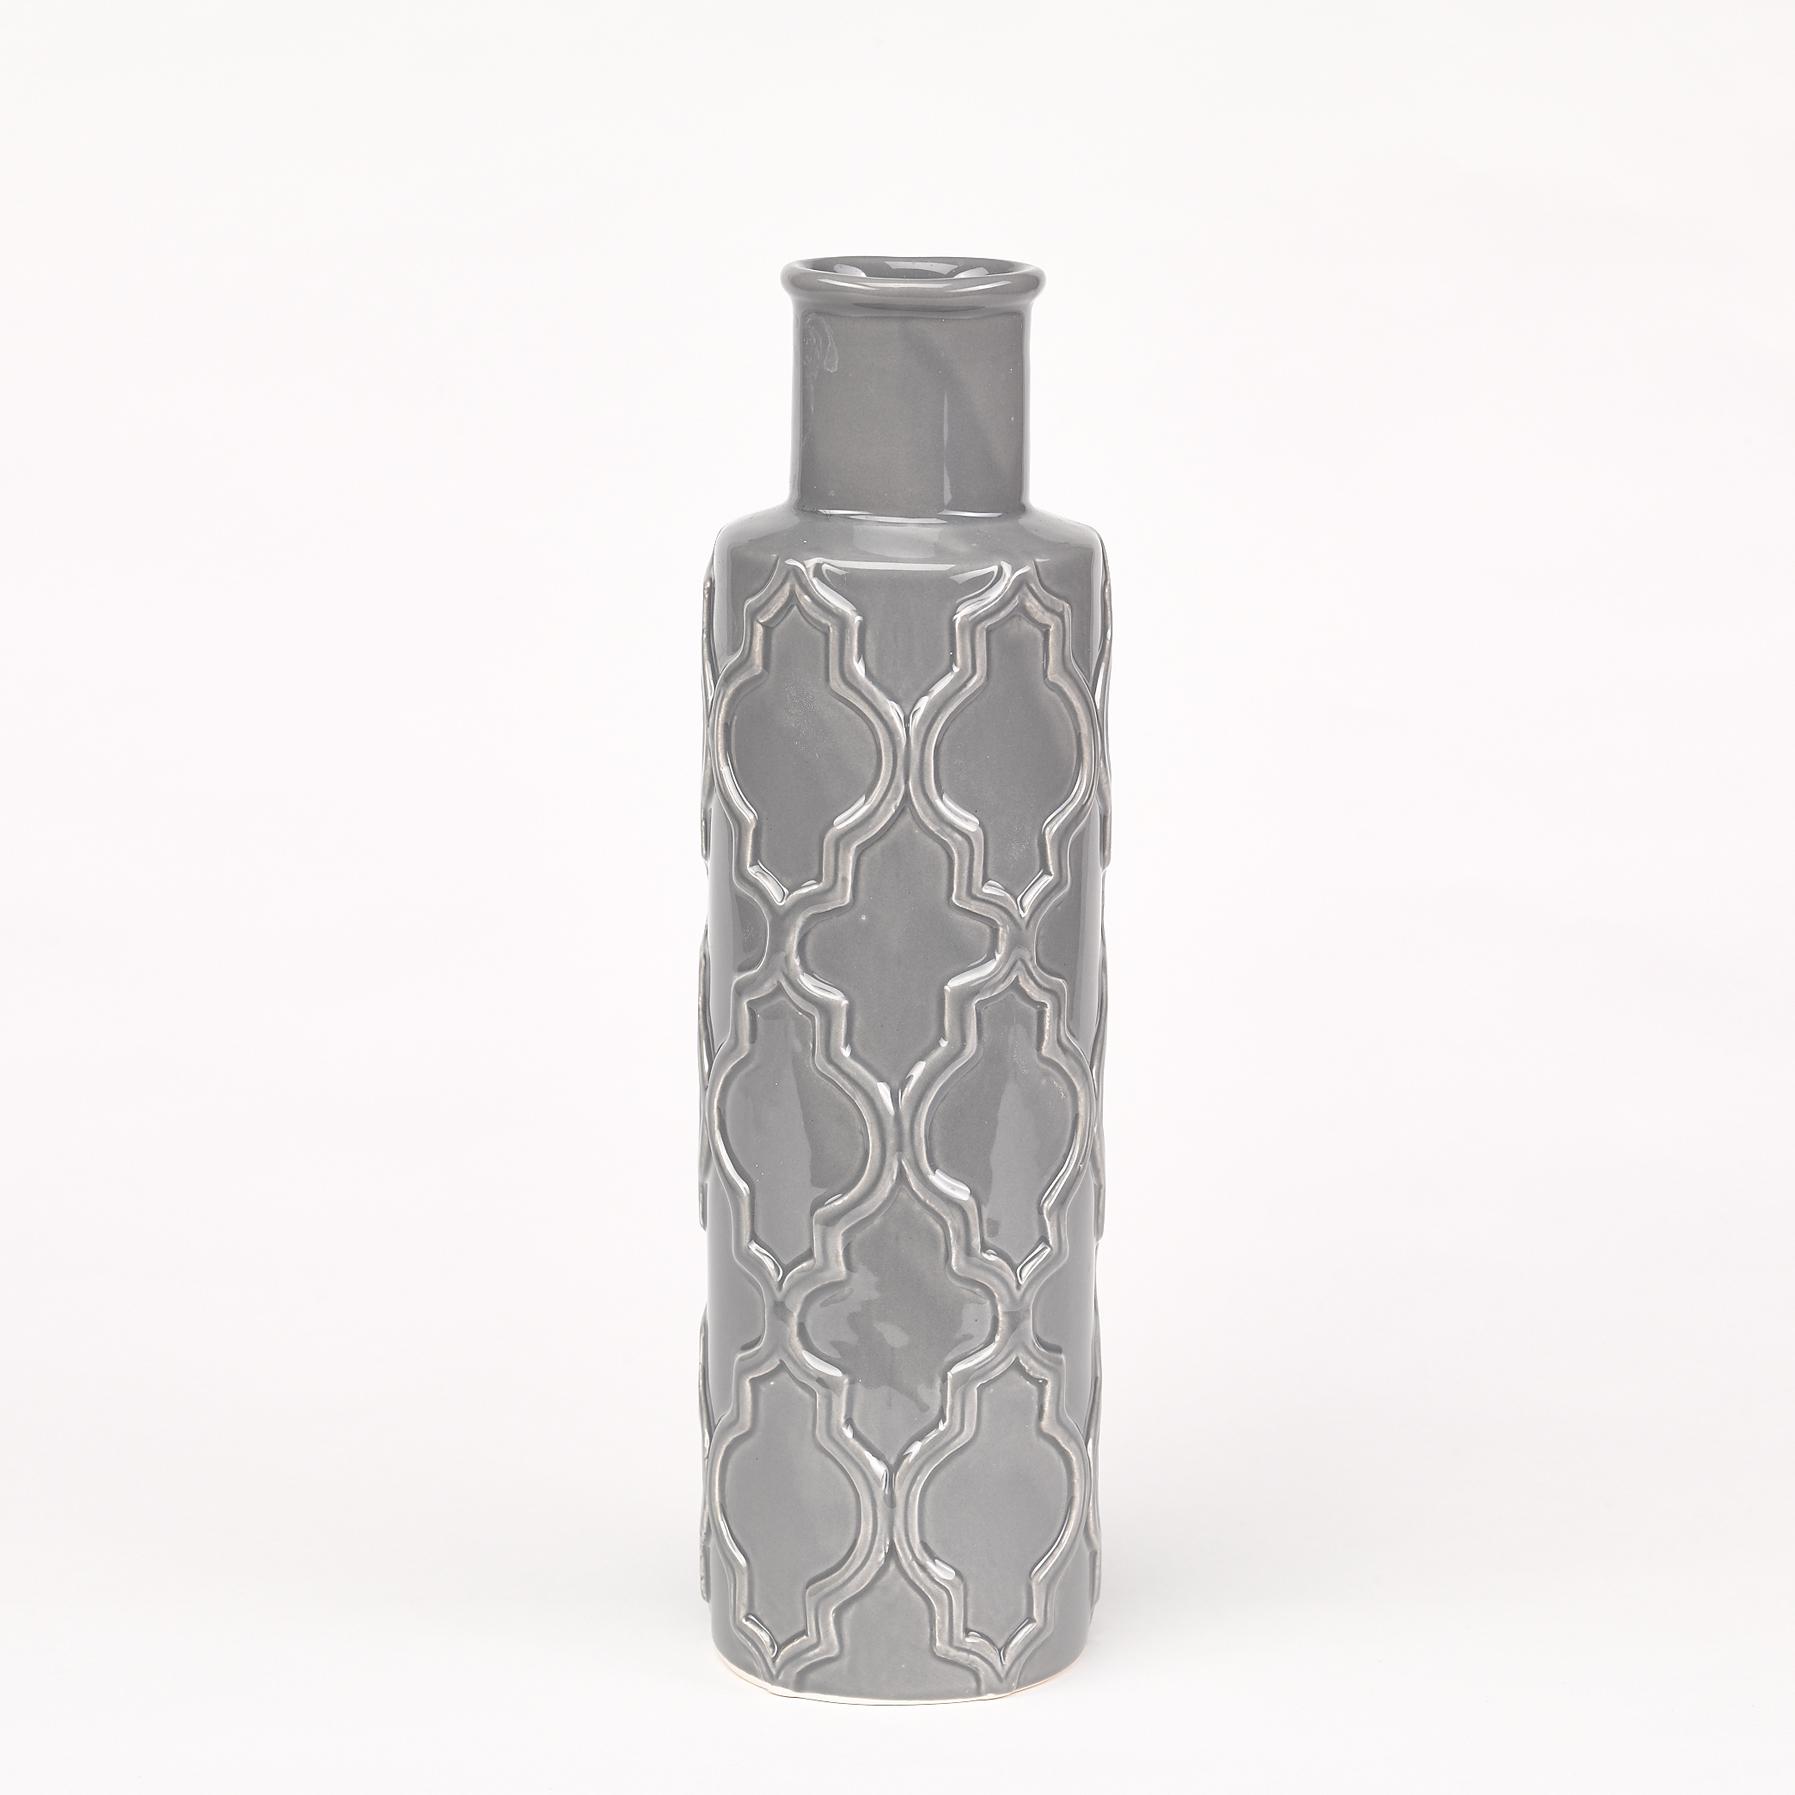 vase gris clair